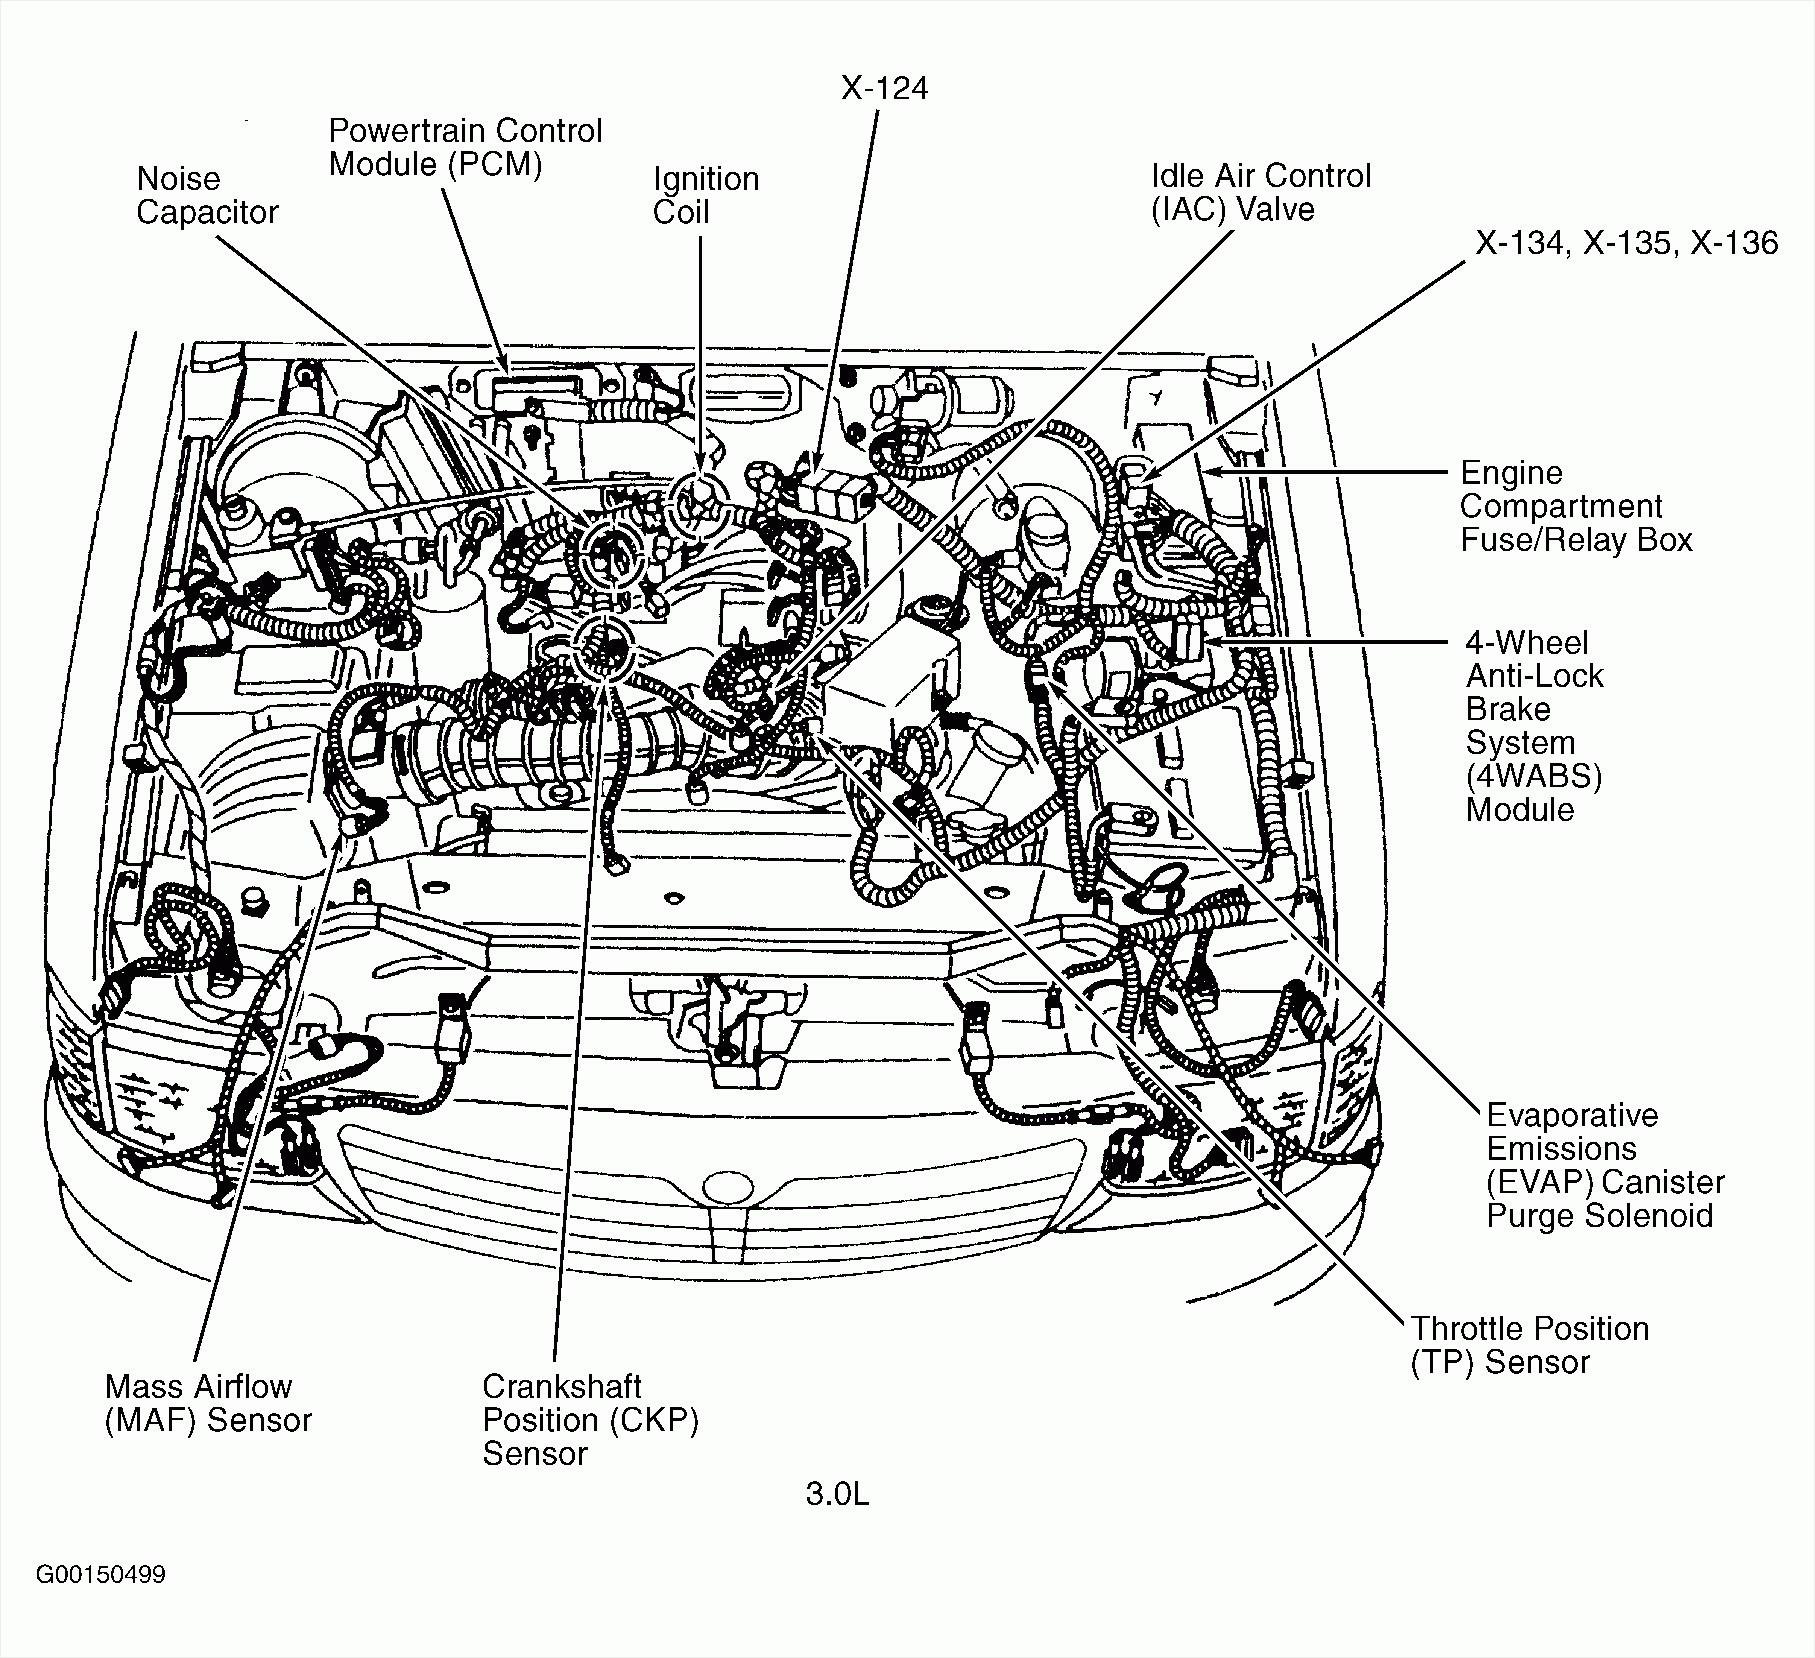 1989 ford ranger engine diagram aerostar engine diagram wiring diagram  aerostar engine diagram wiring diagram